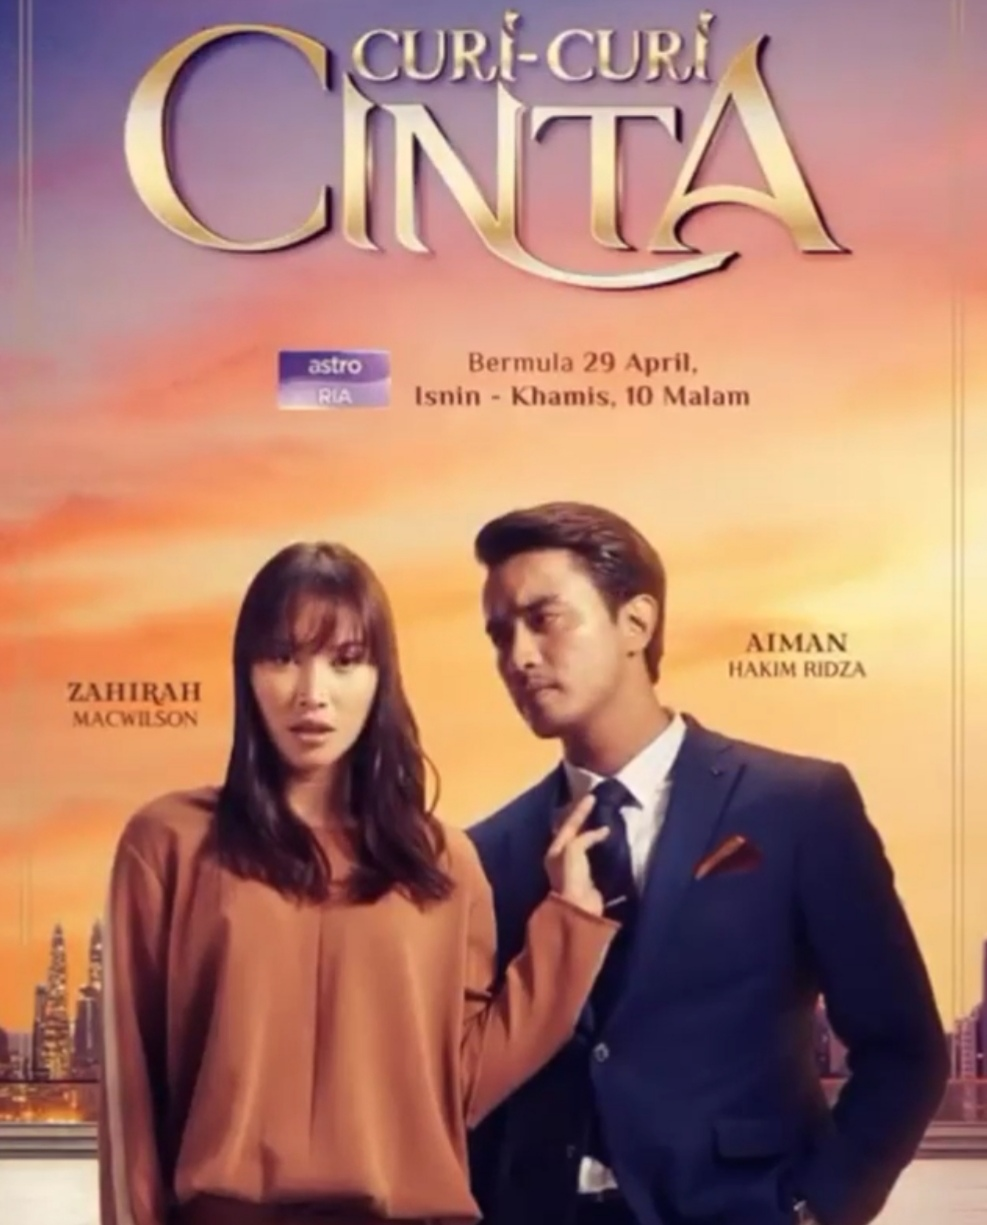 Drama Curi Curi Cinta Episode 1 Episode 28 Mulai 29 April 2019 Hiburan